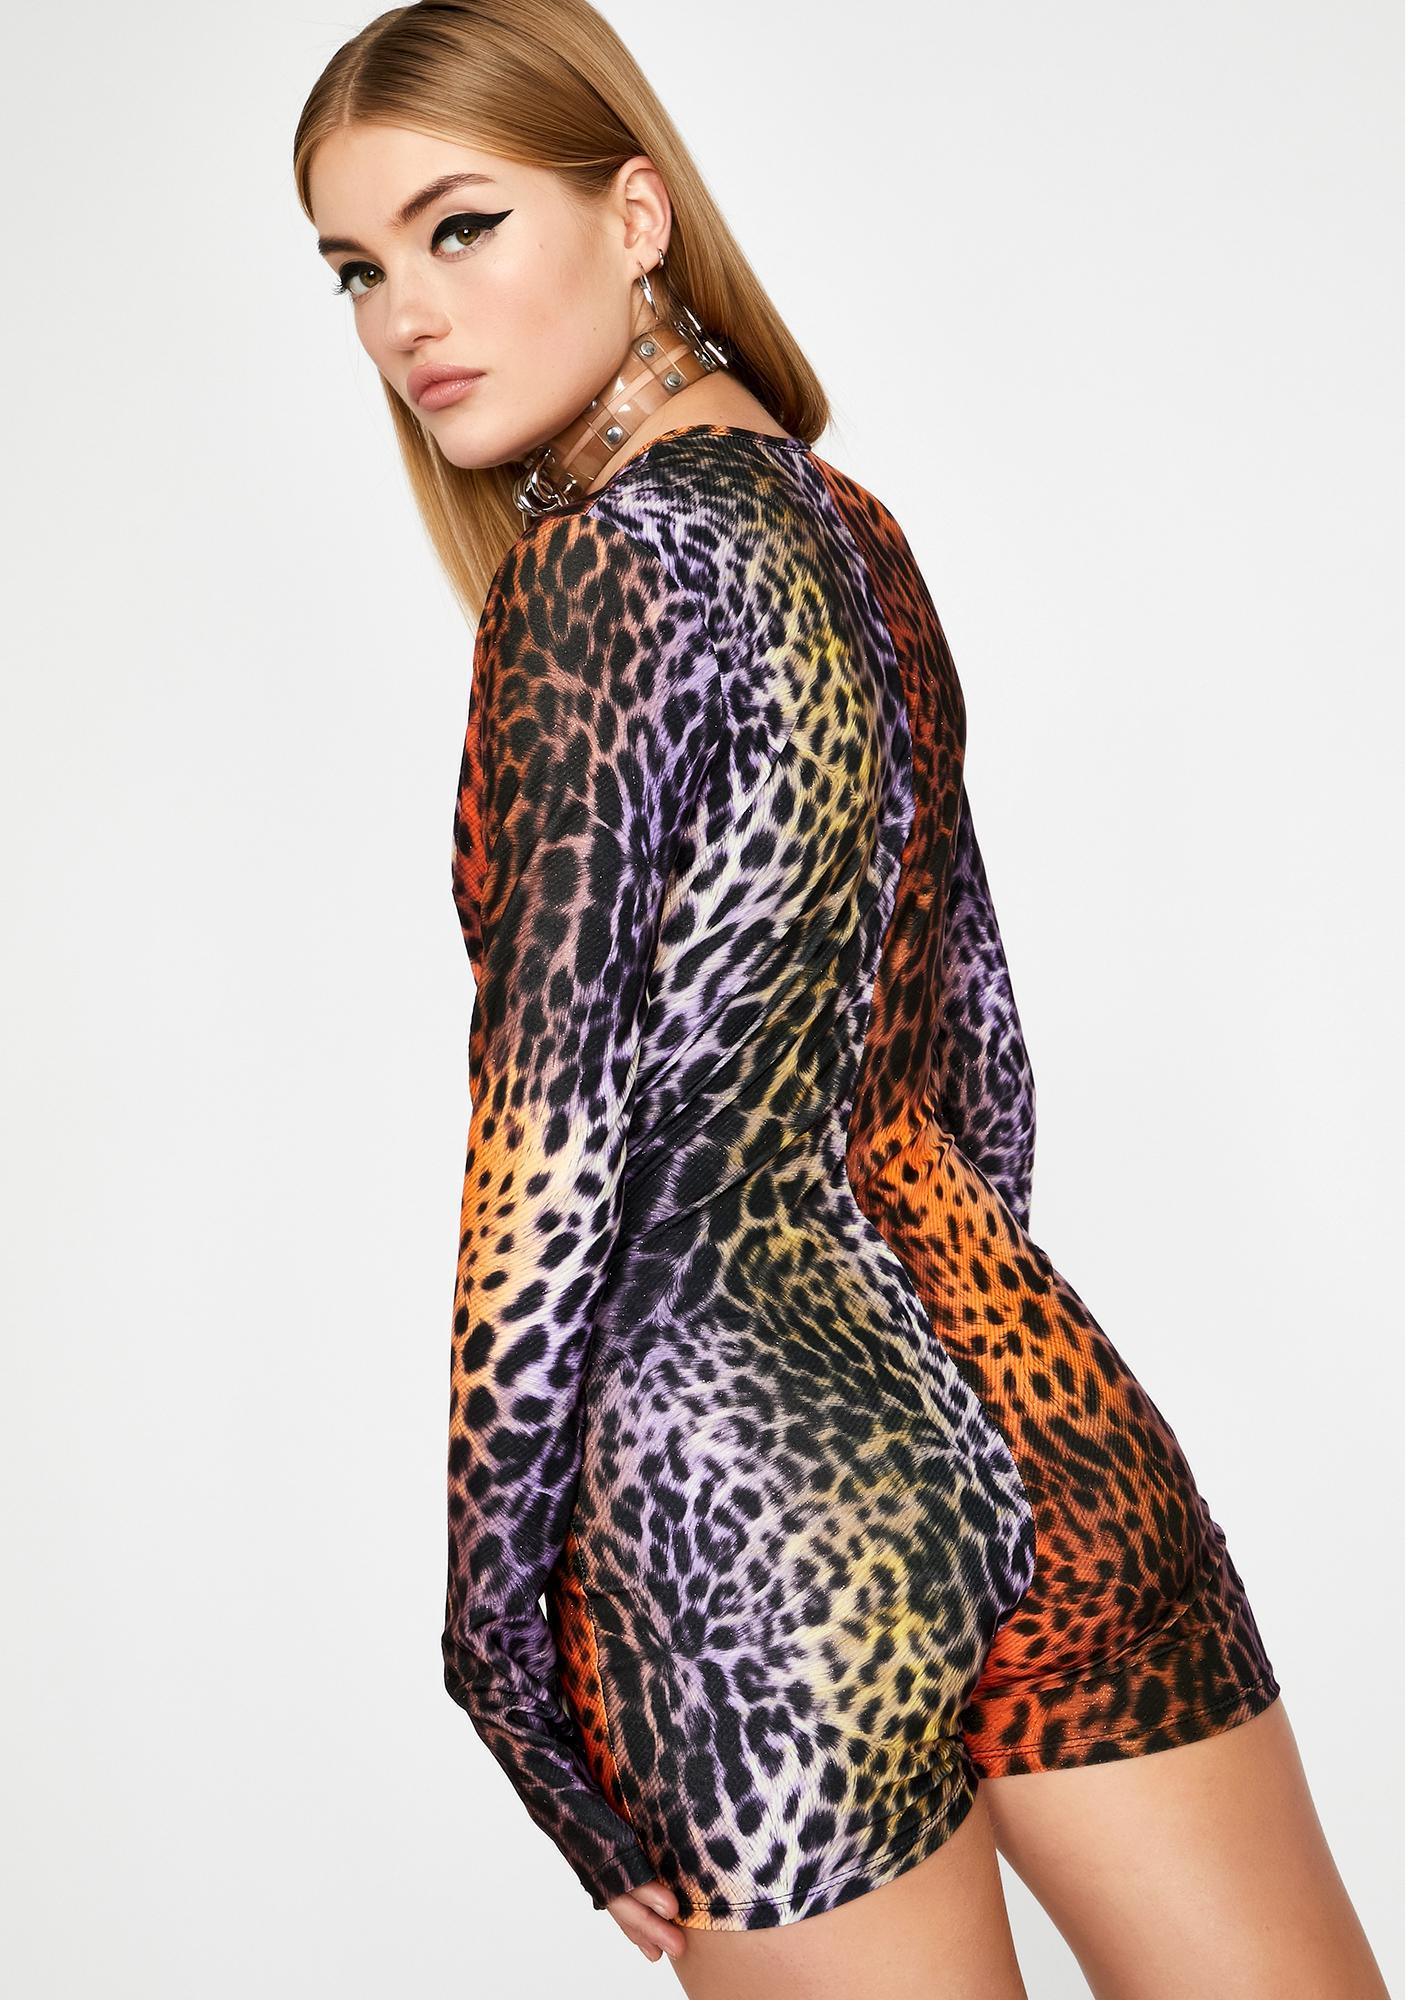 Wild Visions Leopard Romper